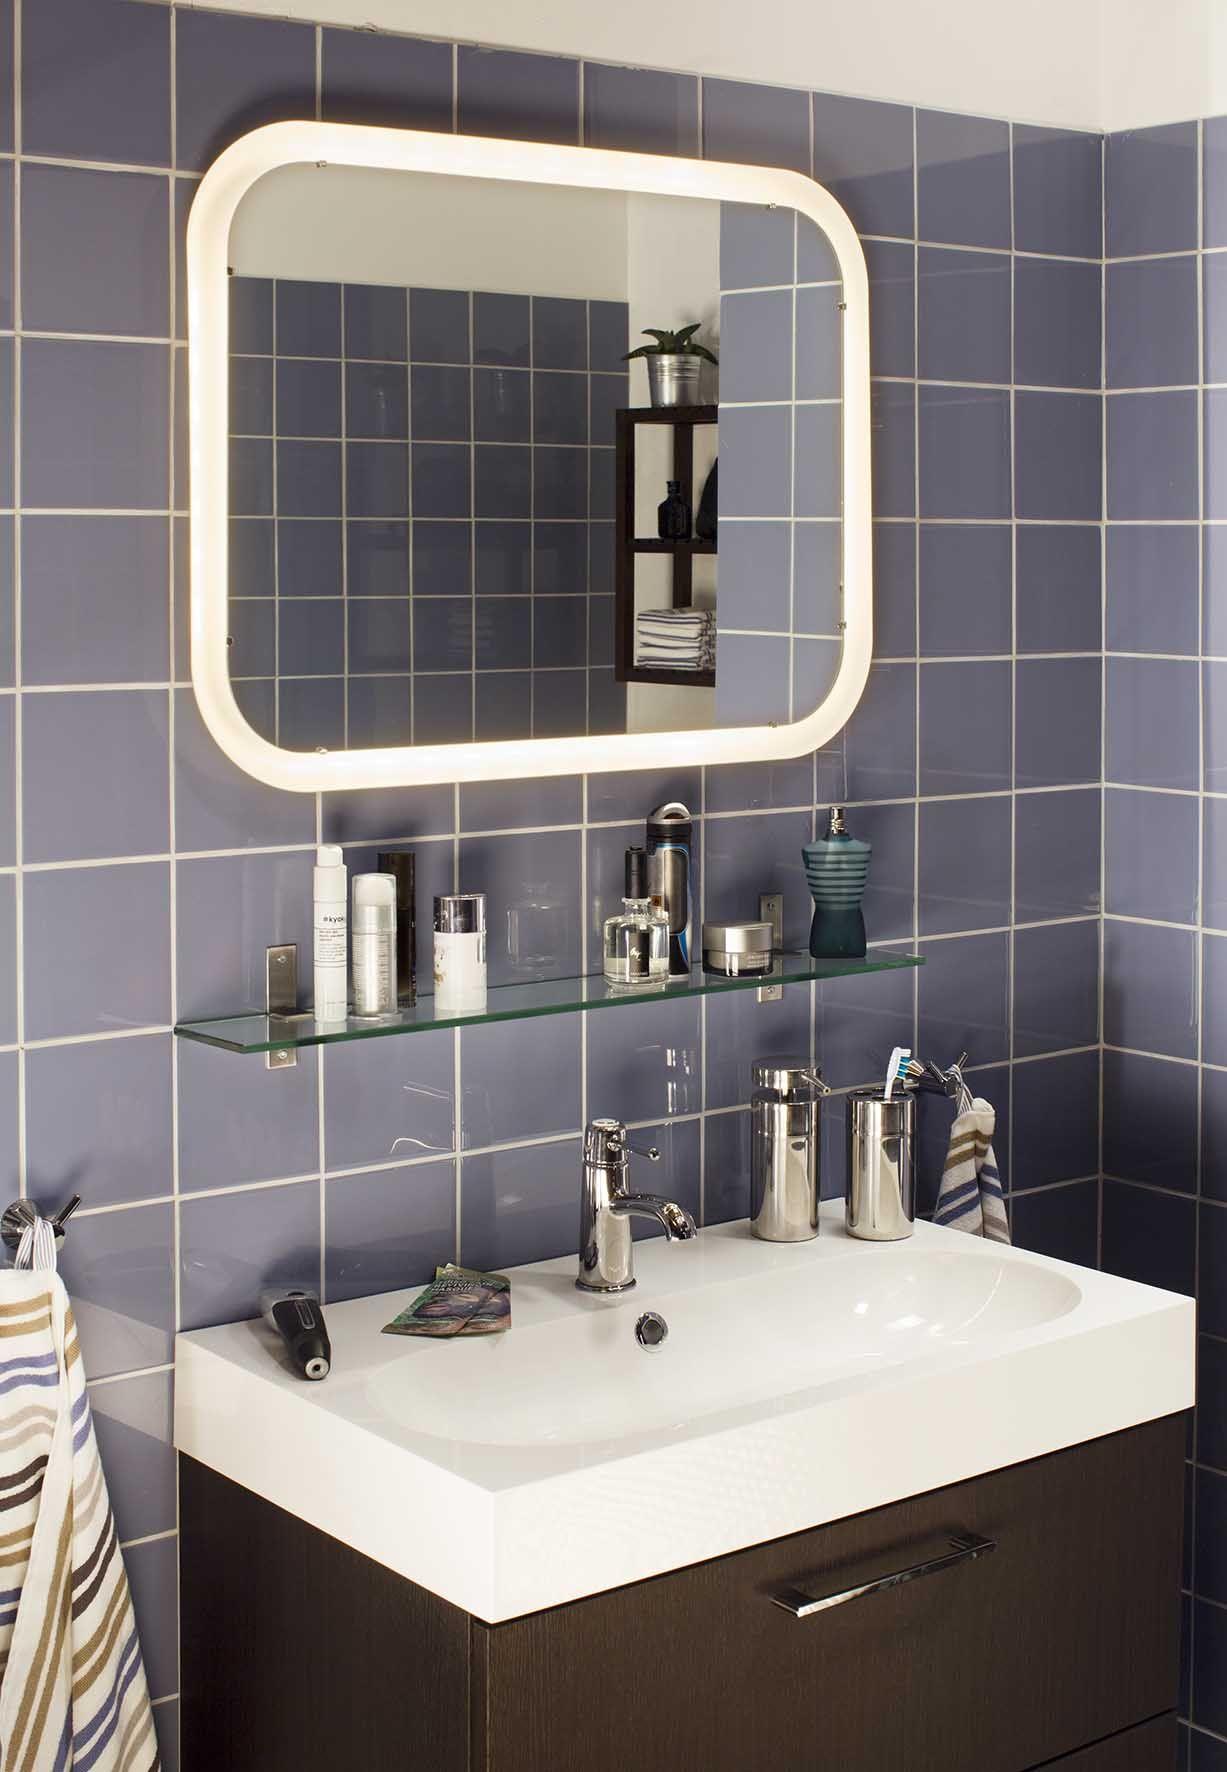 STORJORM Spiegel m geïntegreerde verlichting, wit | Toilet, Bath ...